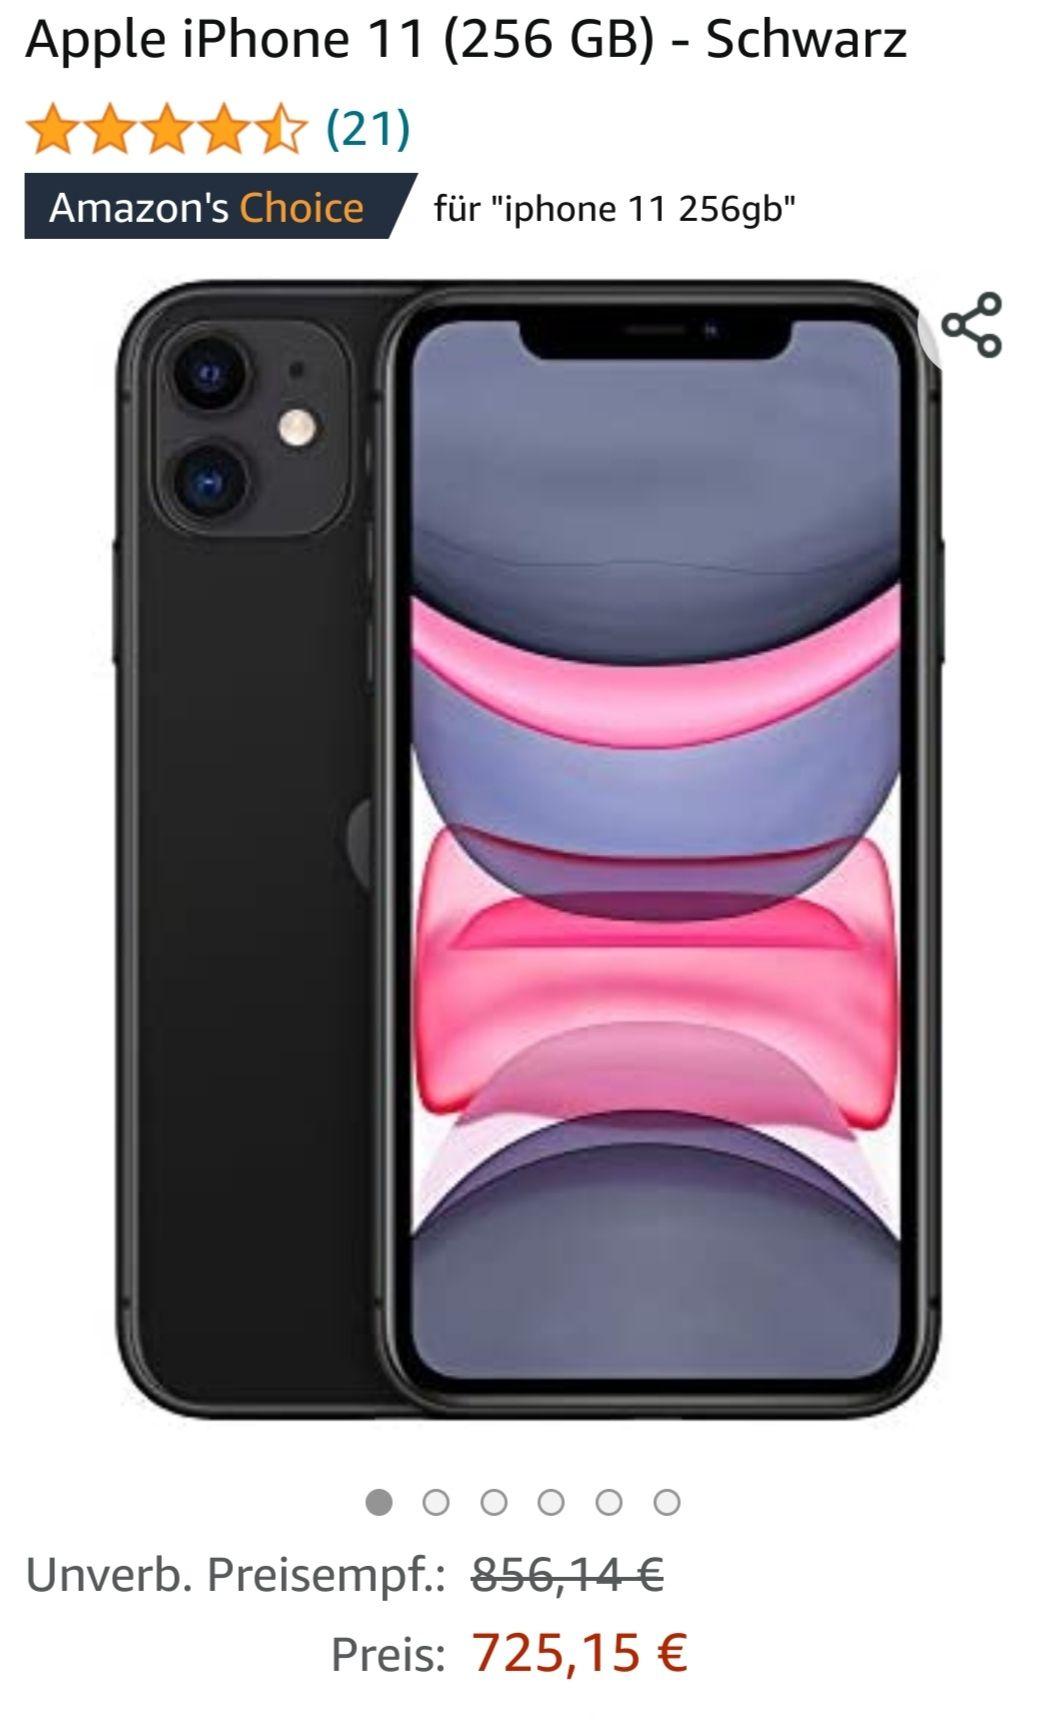 Apple Iphone 11 256gb Schwarz auf Amazon.de